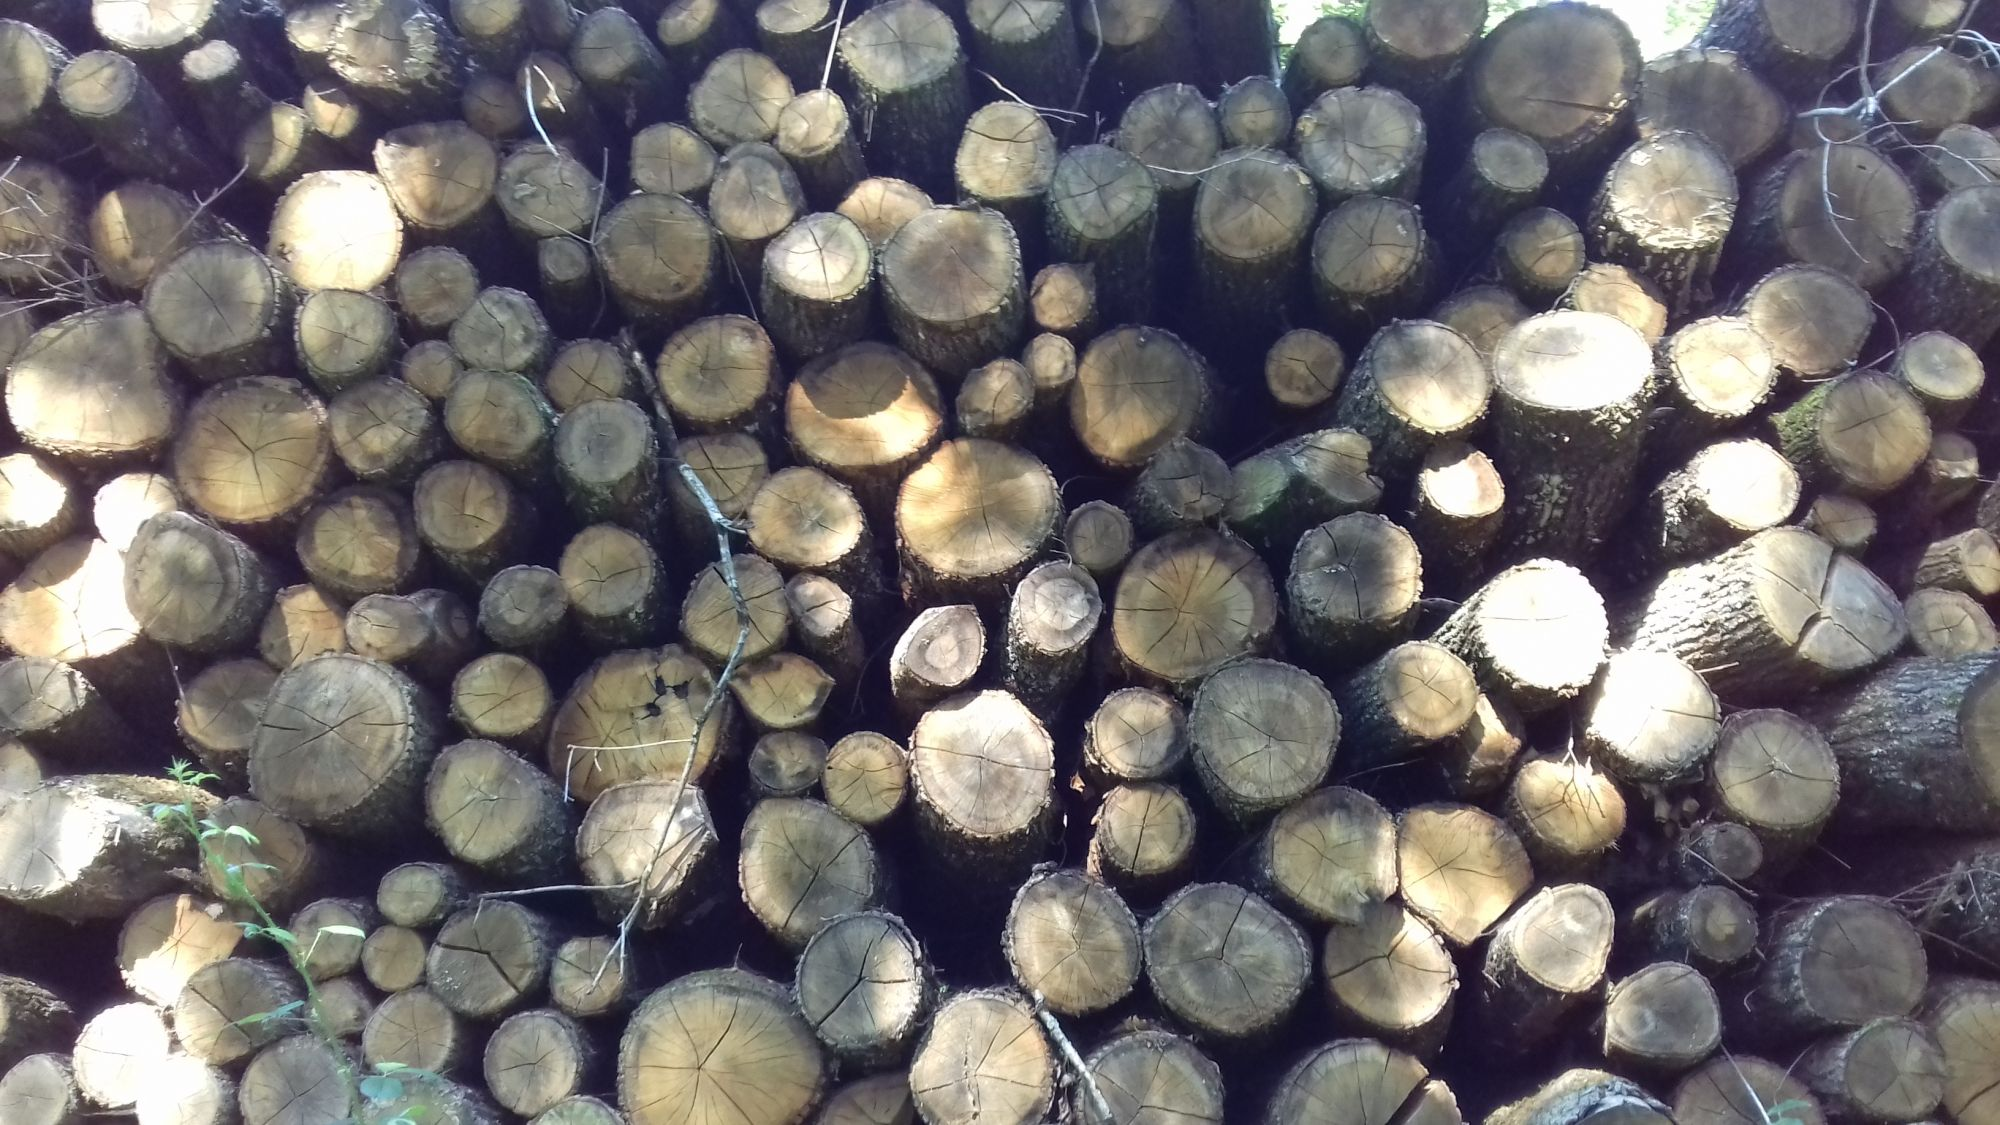 bois de chauffage 17bois de chauffage Charente-Maritime